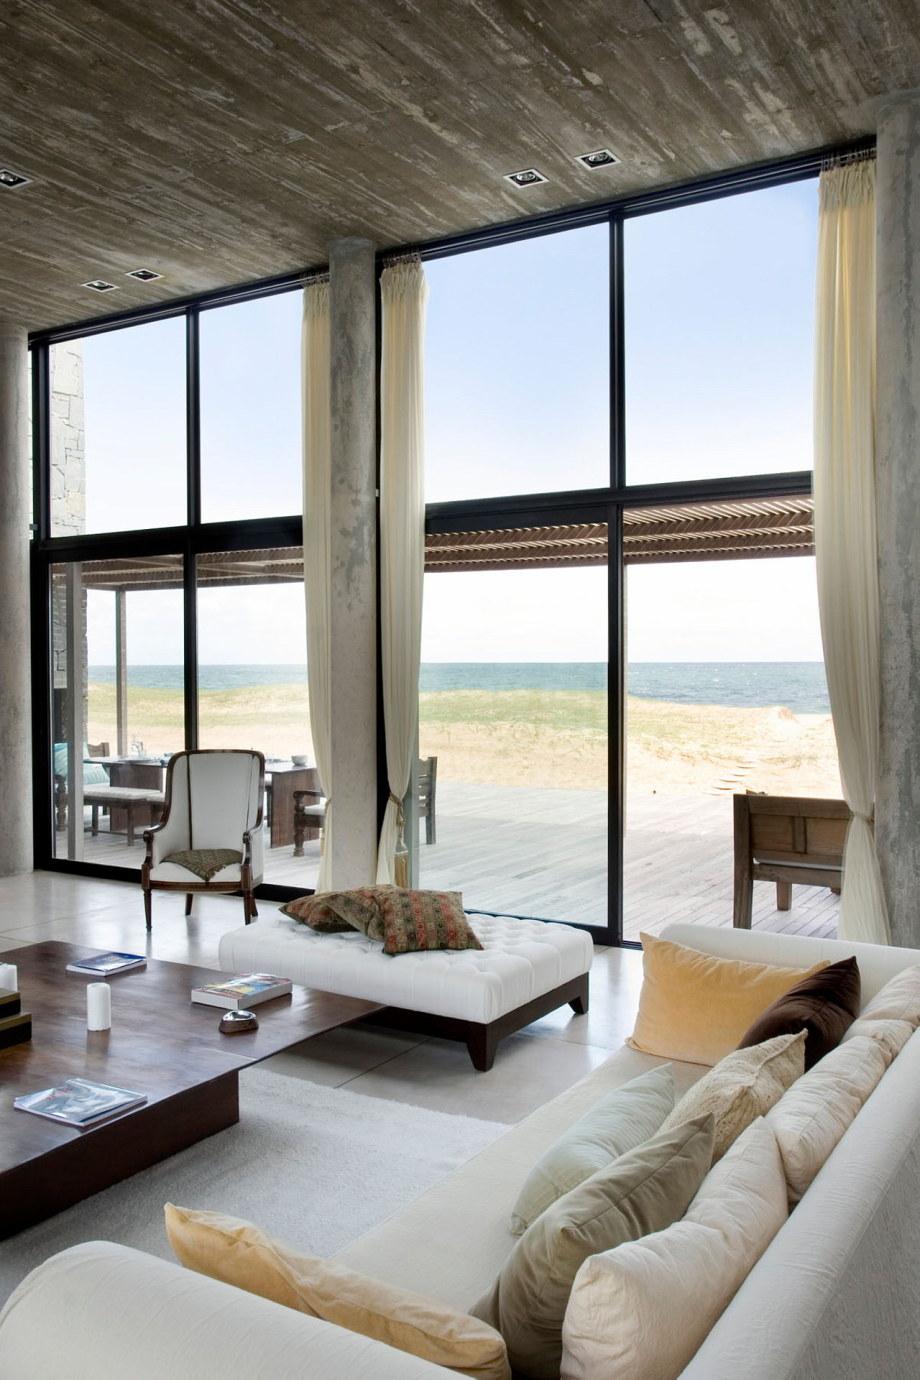 The beach house La Boyita Residence by Martin Gomez Arguitectos, Uruguay 16